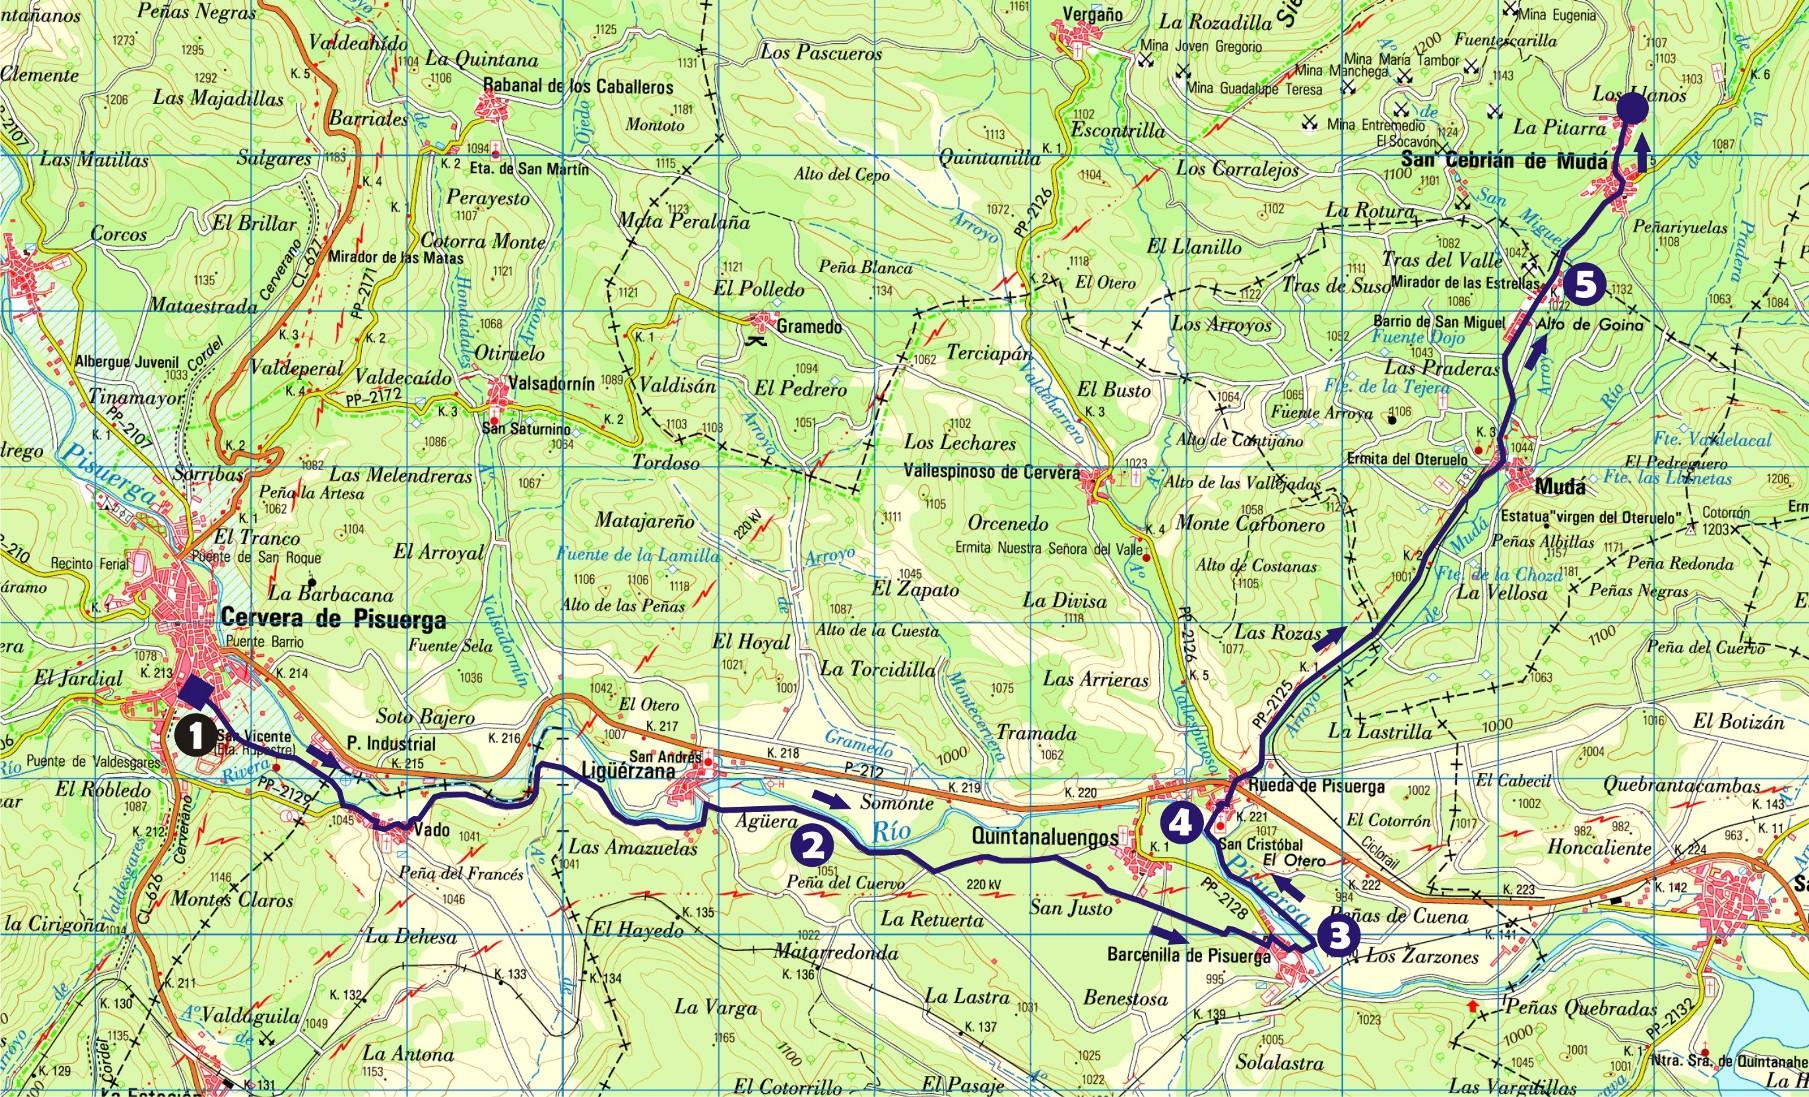 Ruta a la Reserva del Bisonte Europeo (33 kms.)